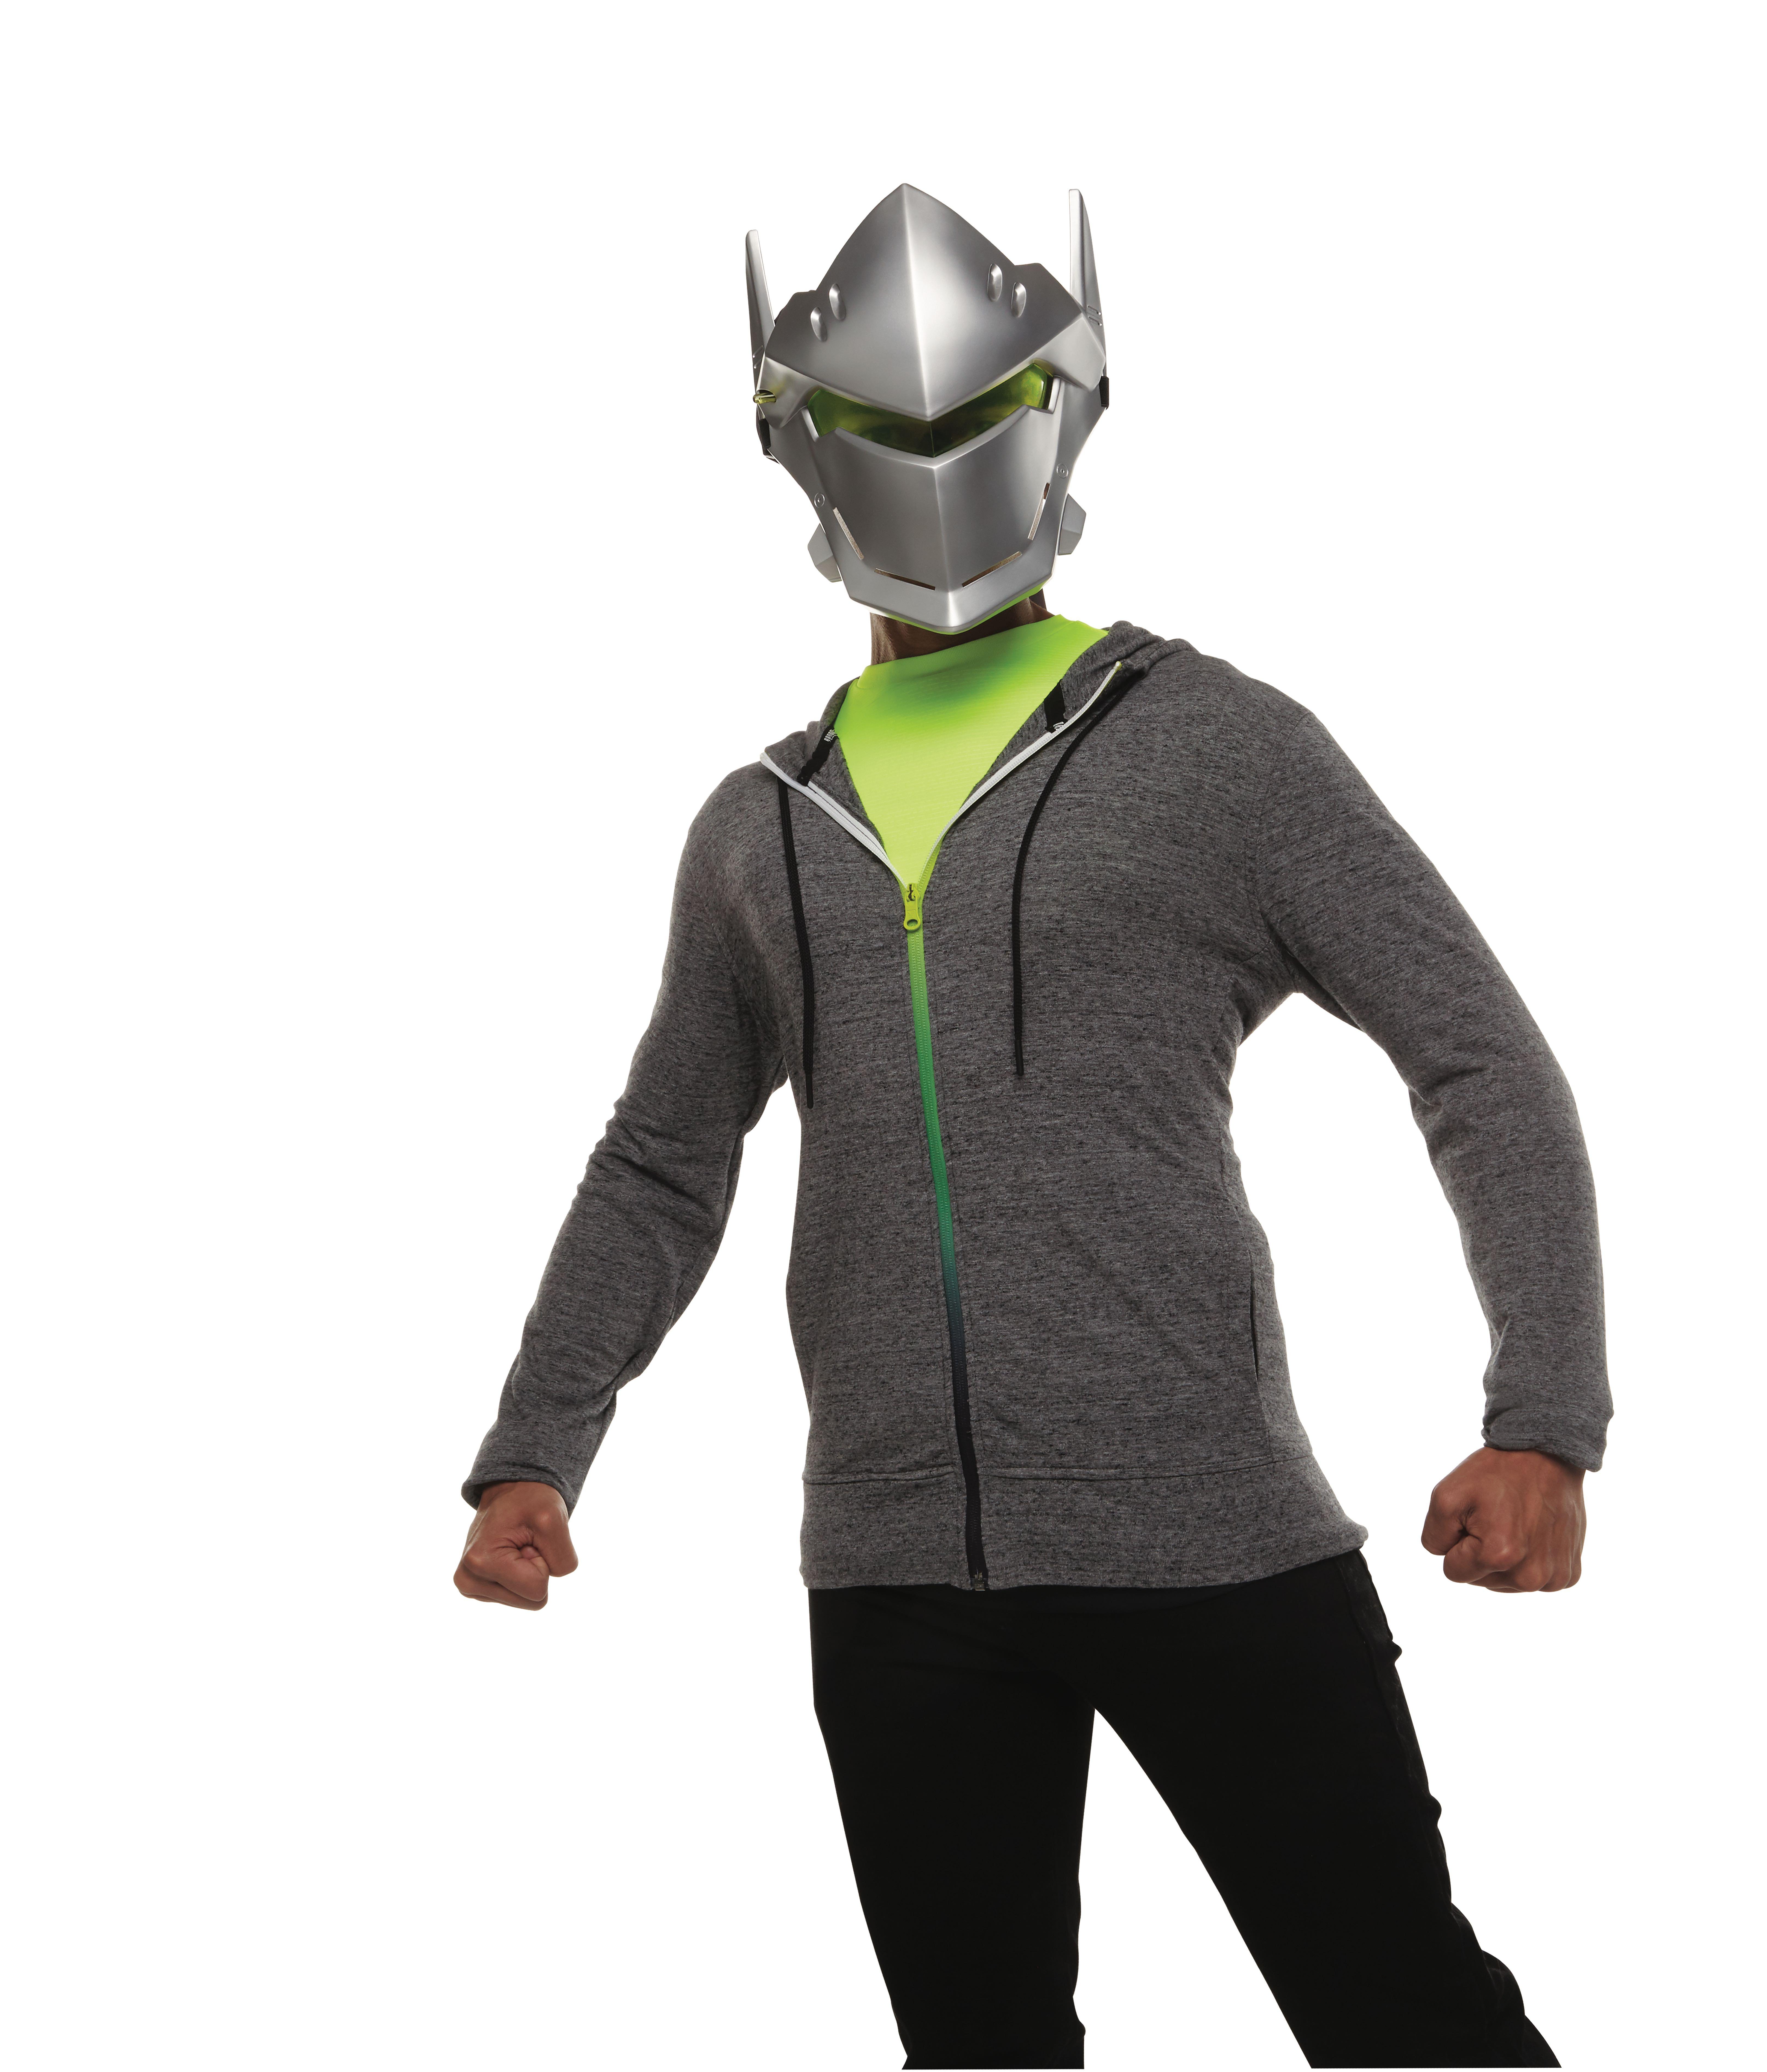 Overwatch Genji Roleplay Mask